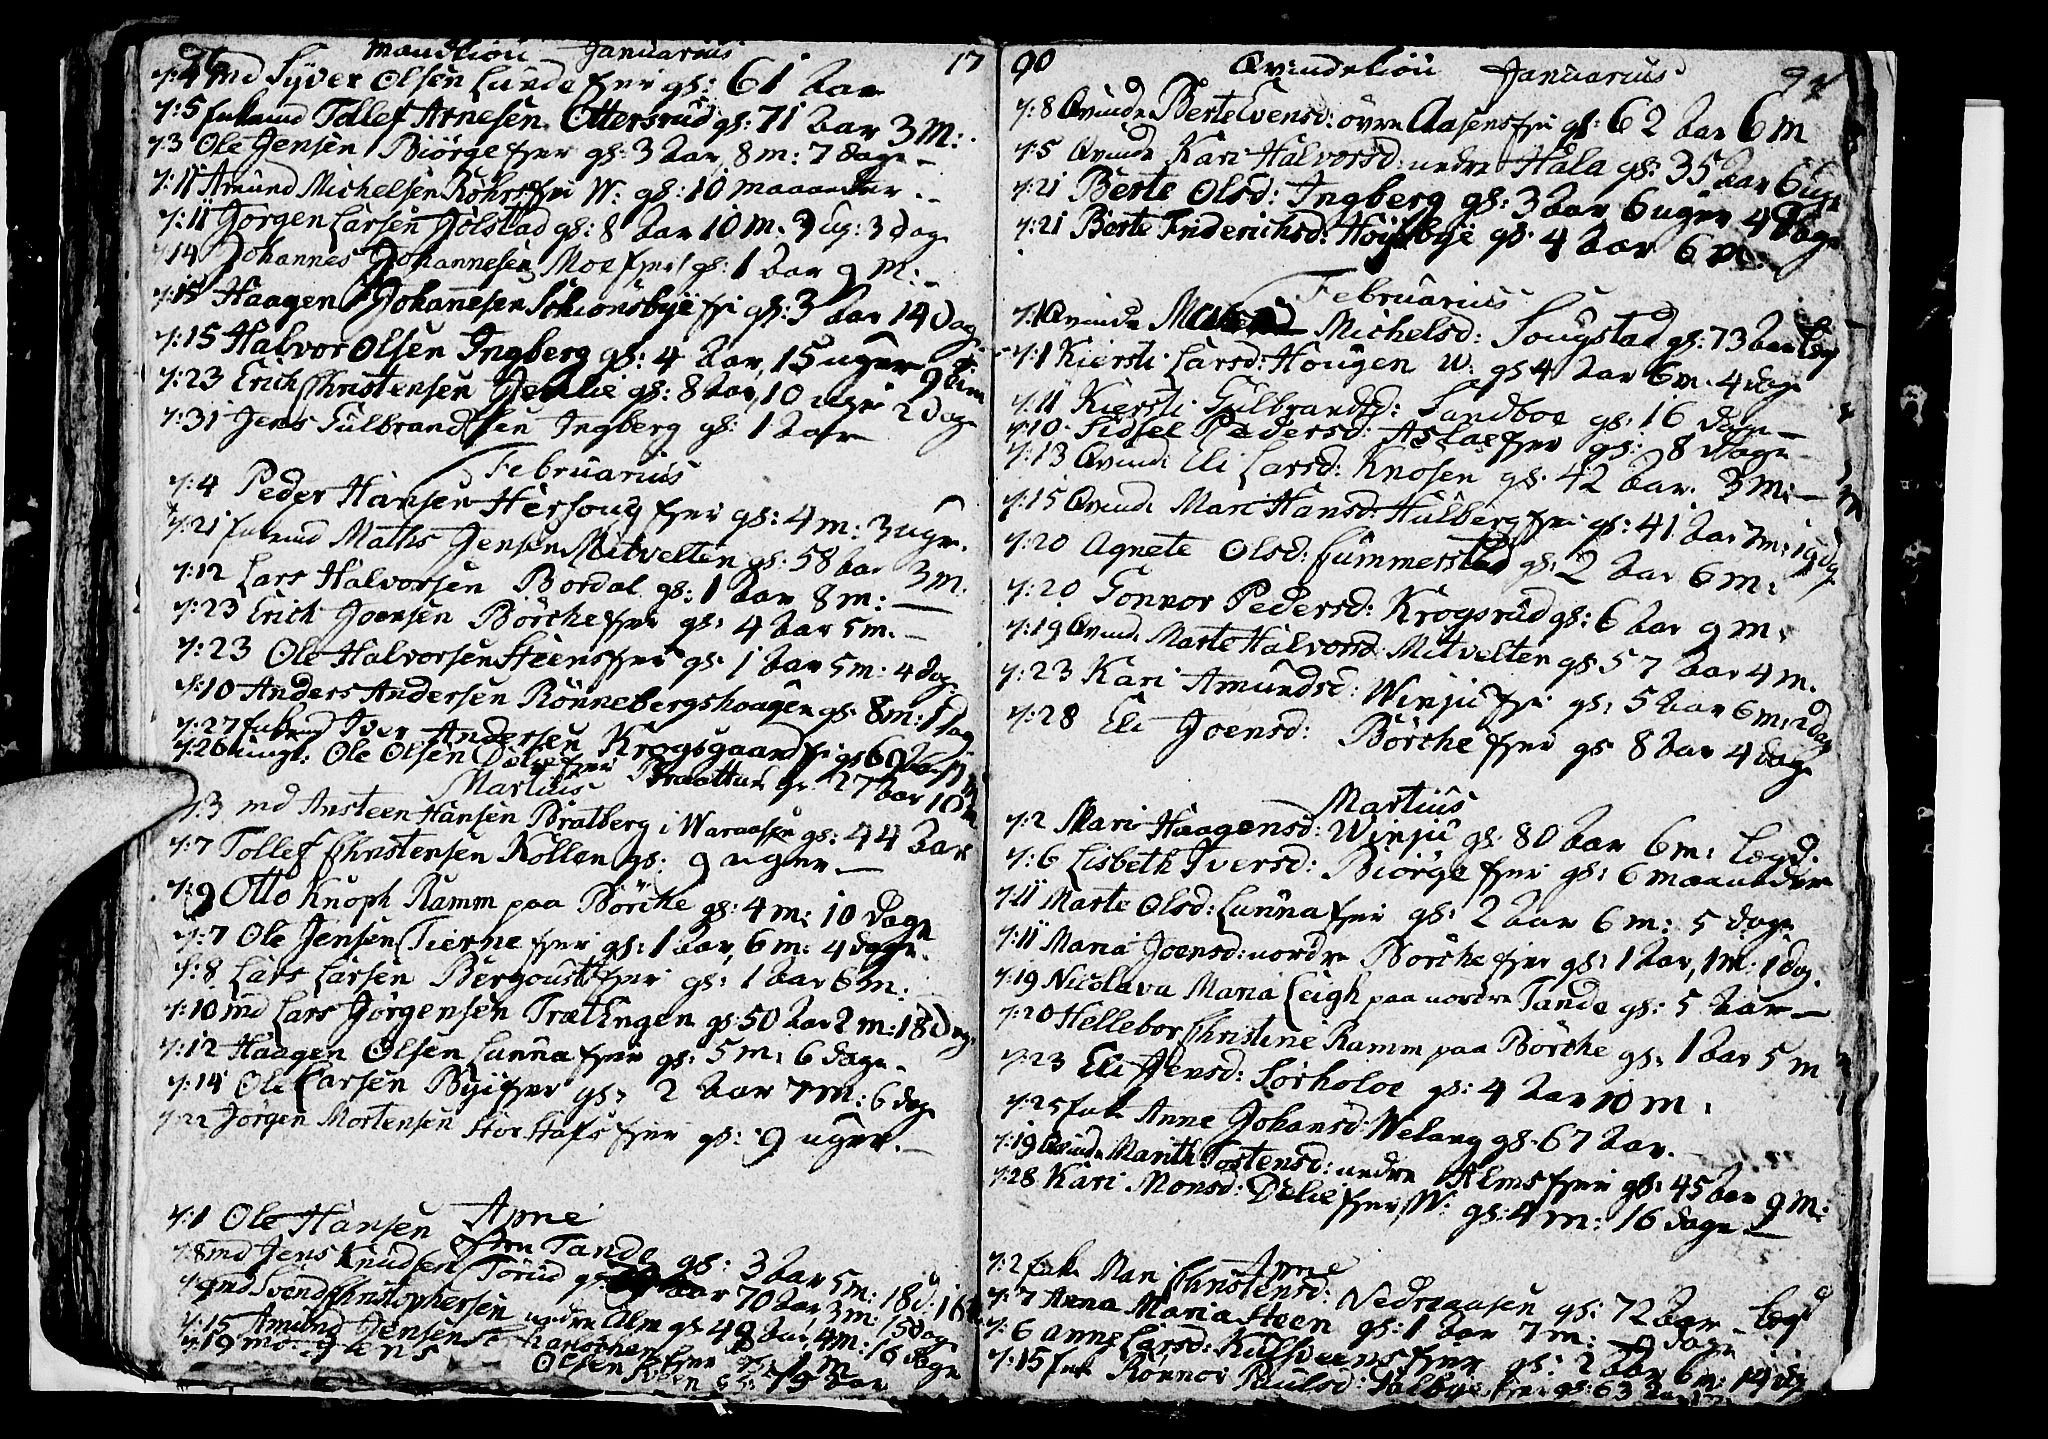 SAH, Ringsaker prestekontor, I/Ia/L0005/0005: Parish register draft no. 1E, 1790-1792, p. 96-97